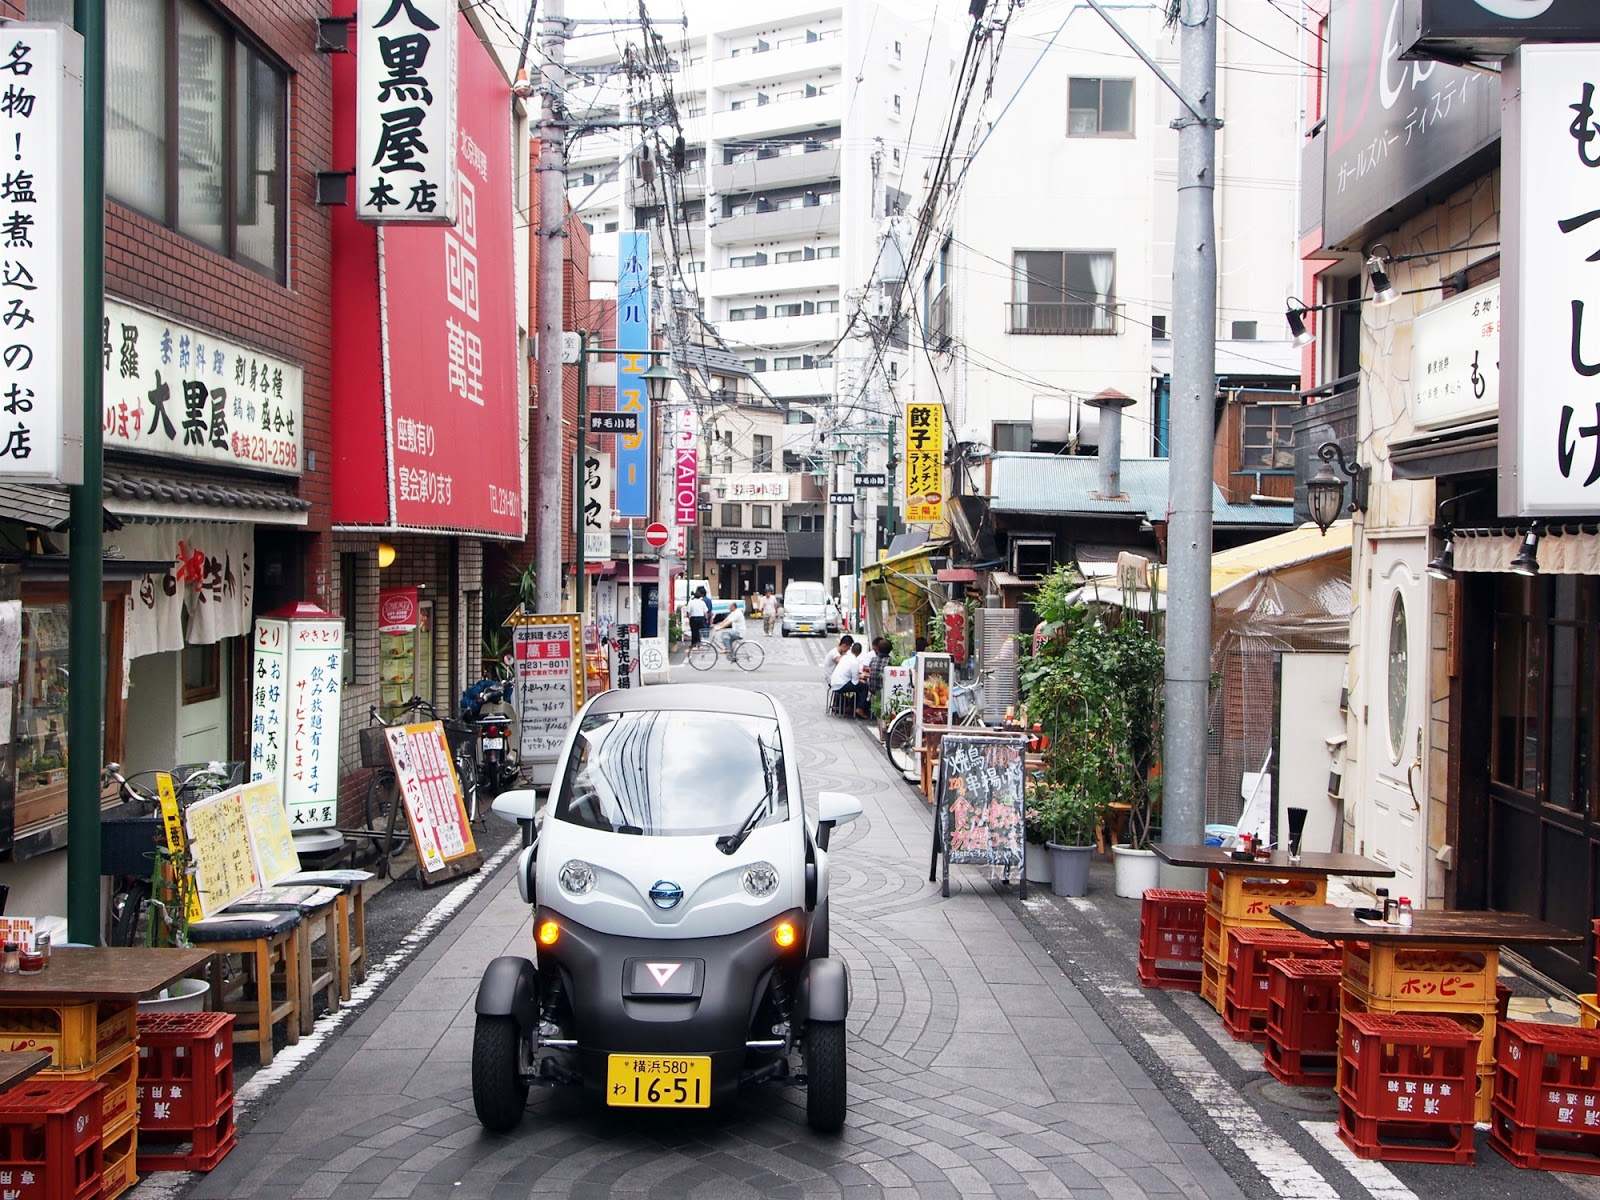 Car sharing Nissan 1 Κοινόχρηστα αυτοκίνητα από την Nissan, στην Ιαπωνία car, car sharing, Electric cars, Nissan, ultra compact, YOKOHAMA